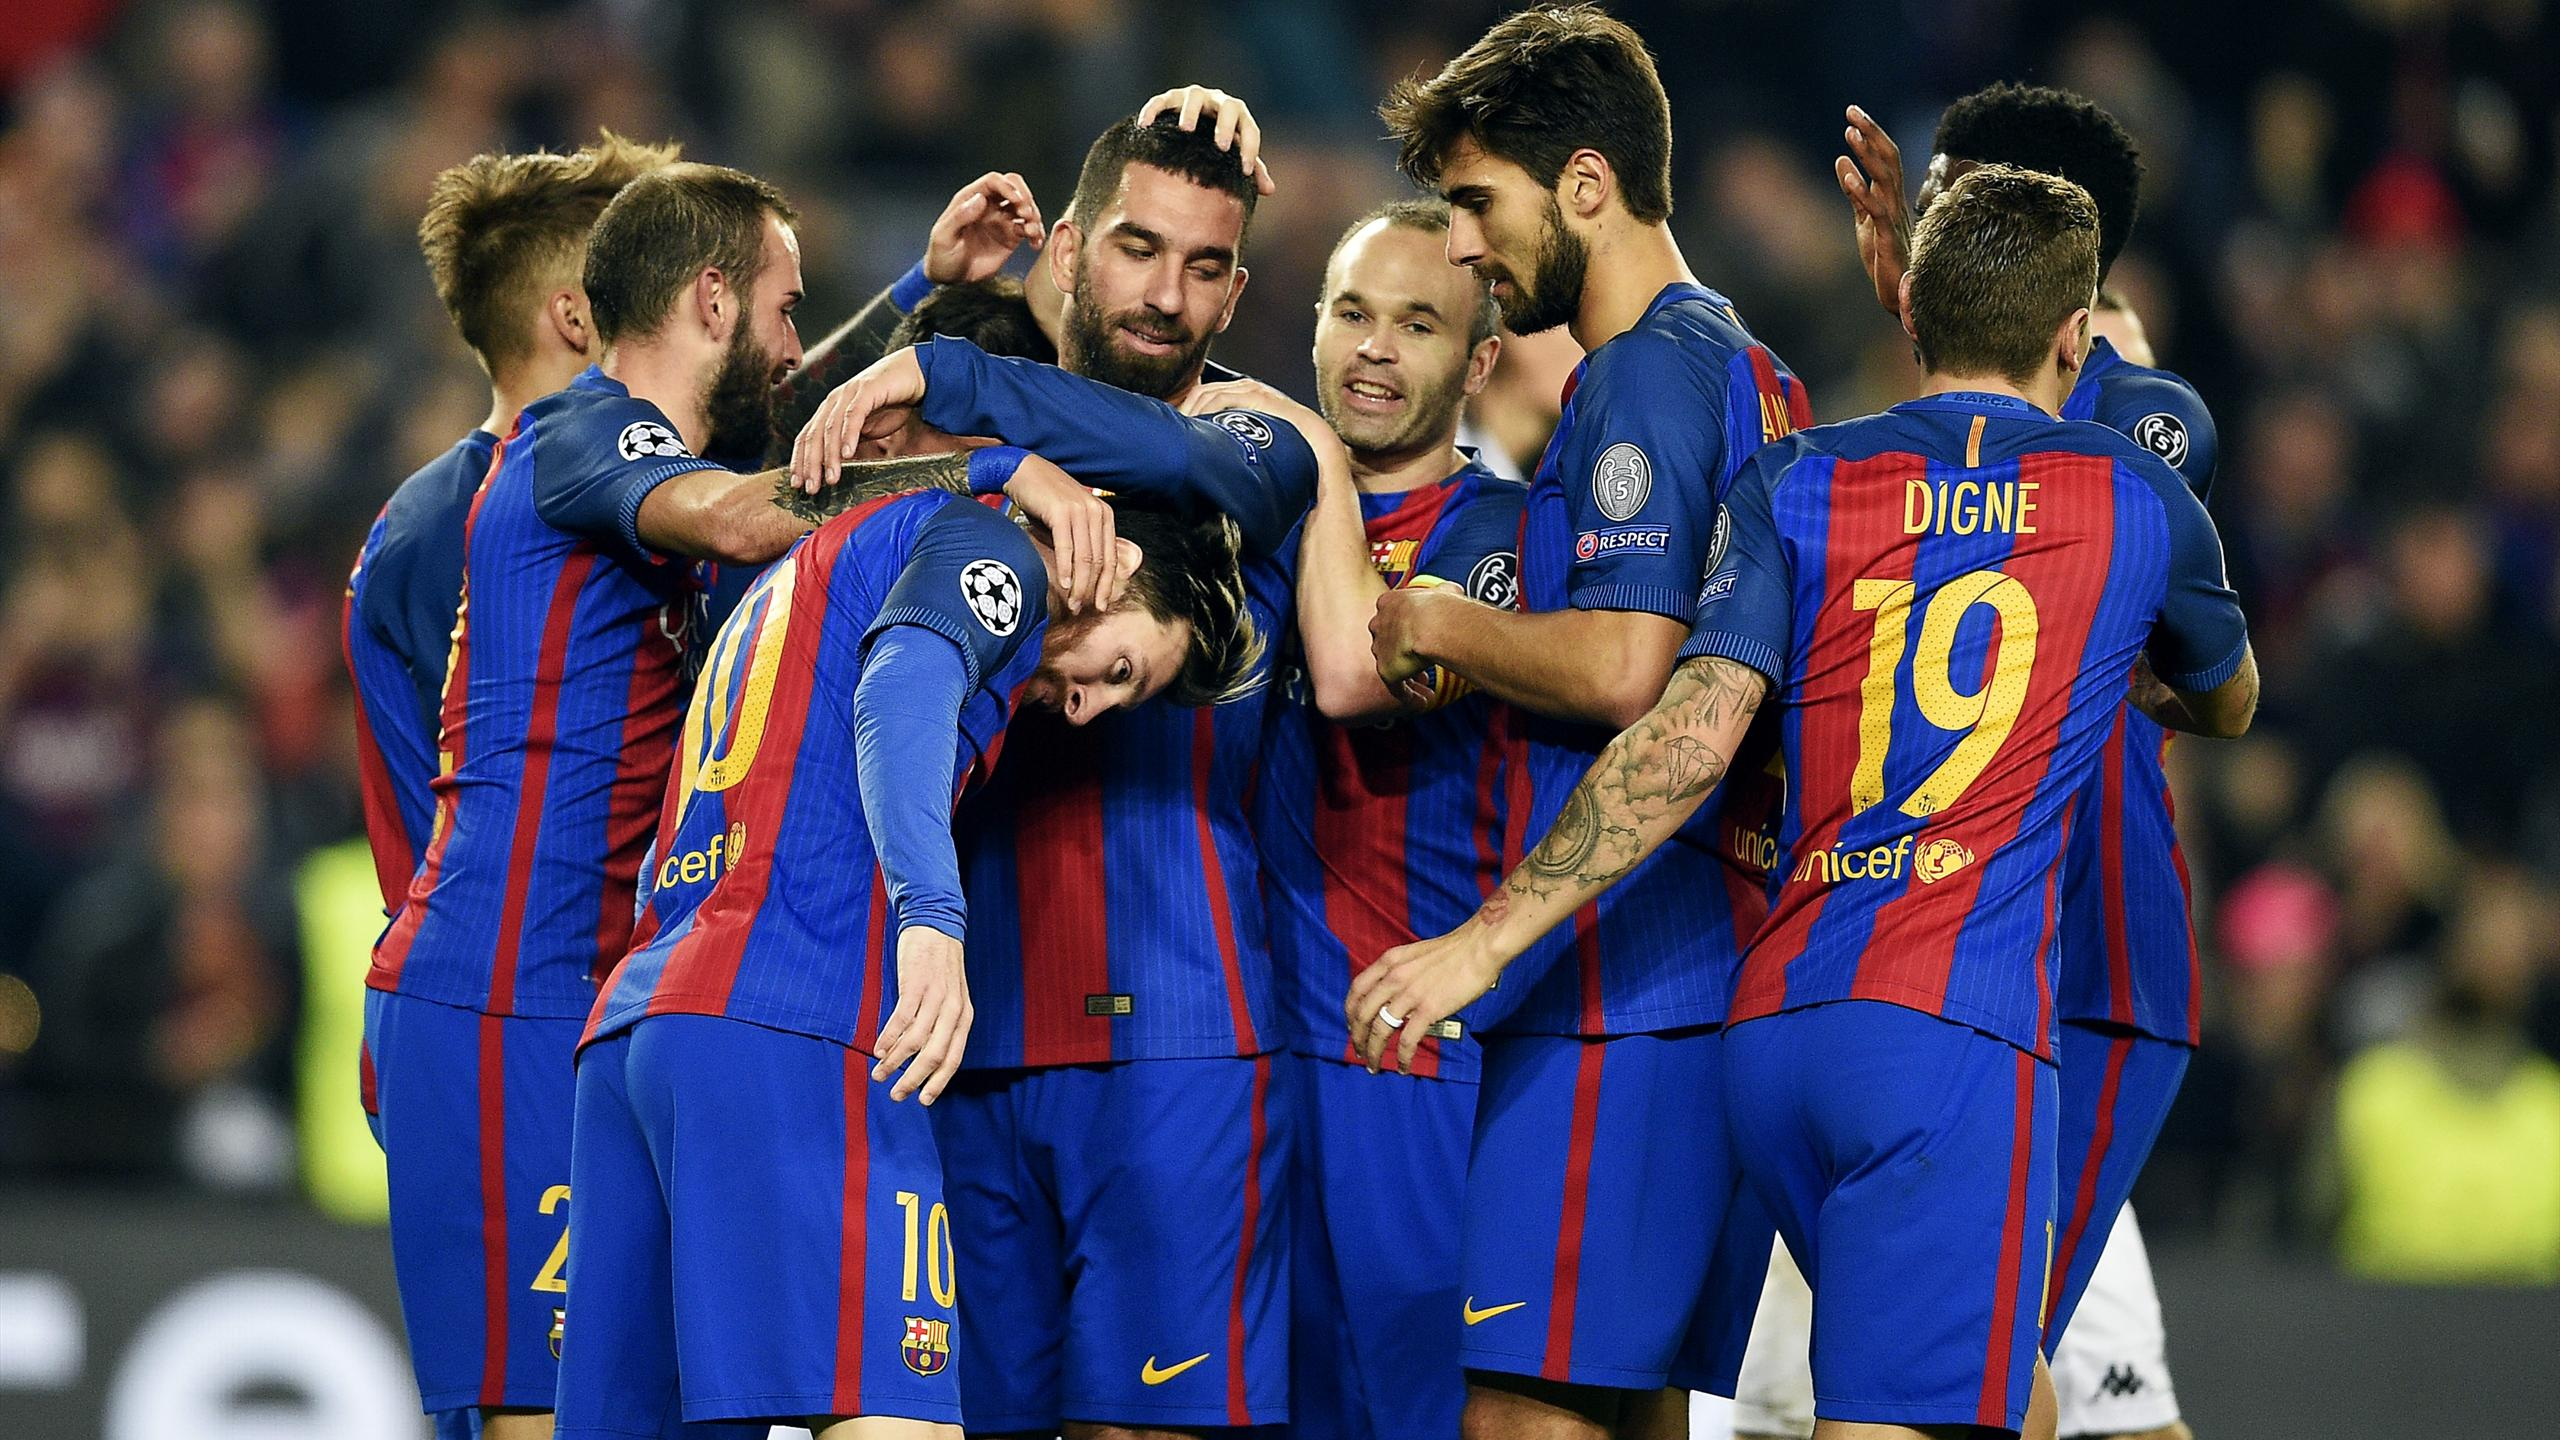 Barcelona's Turkish forward Arda Turan (C) celebrates with teammates